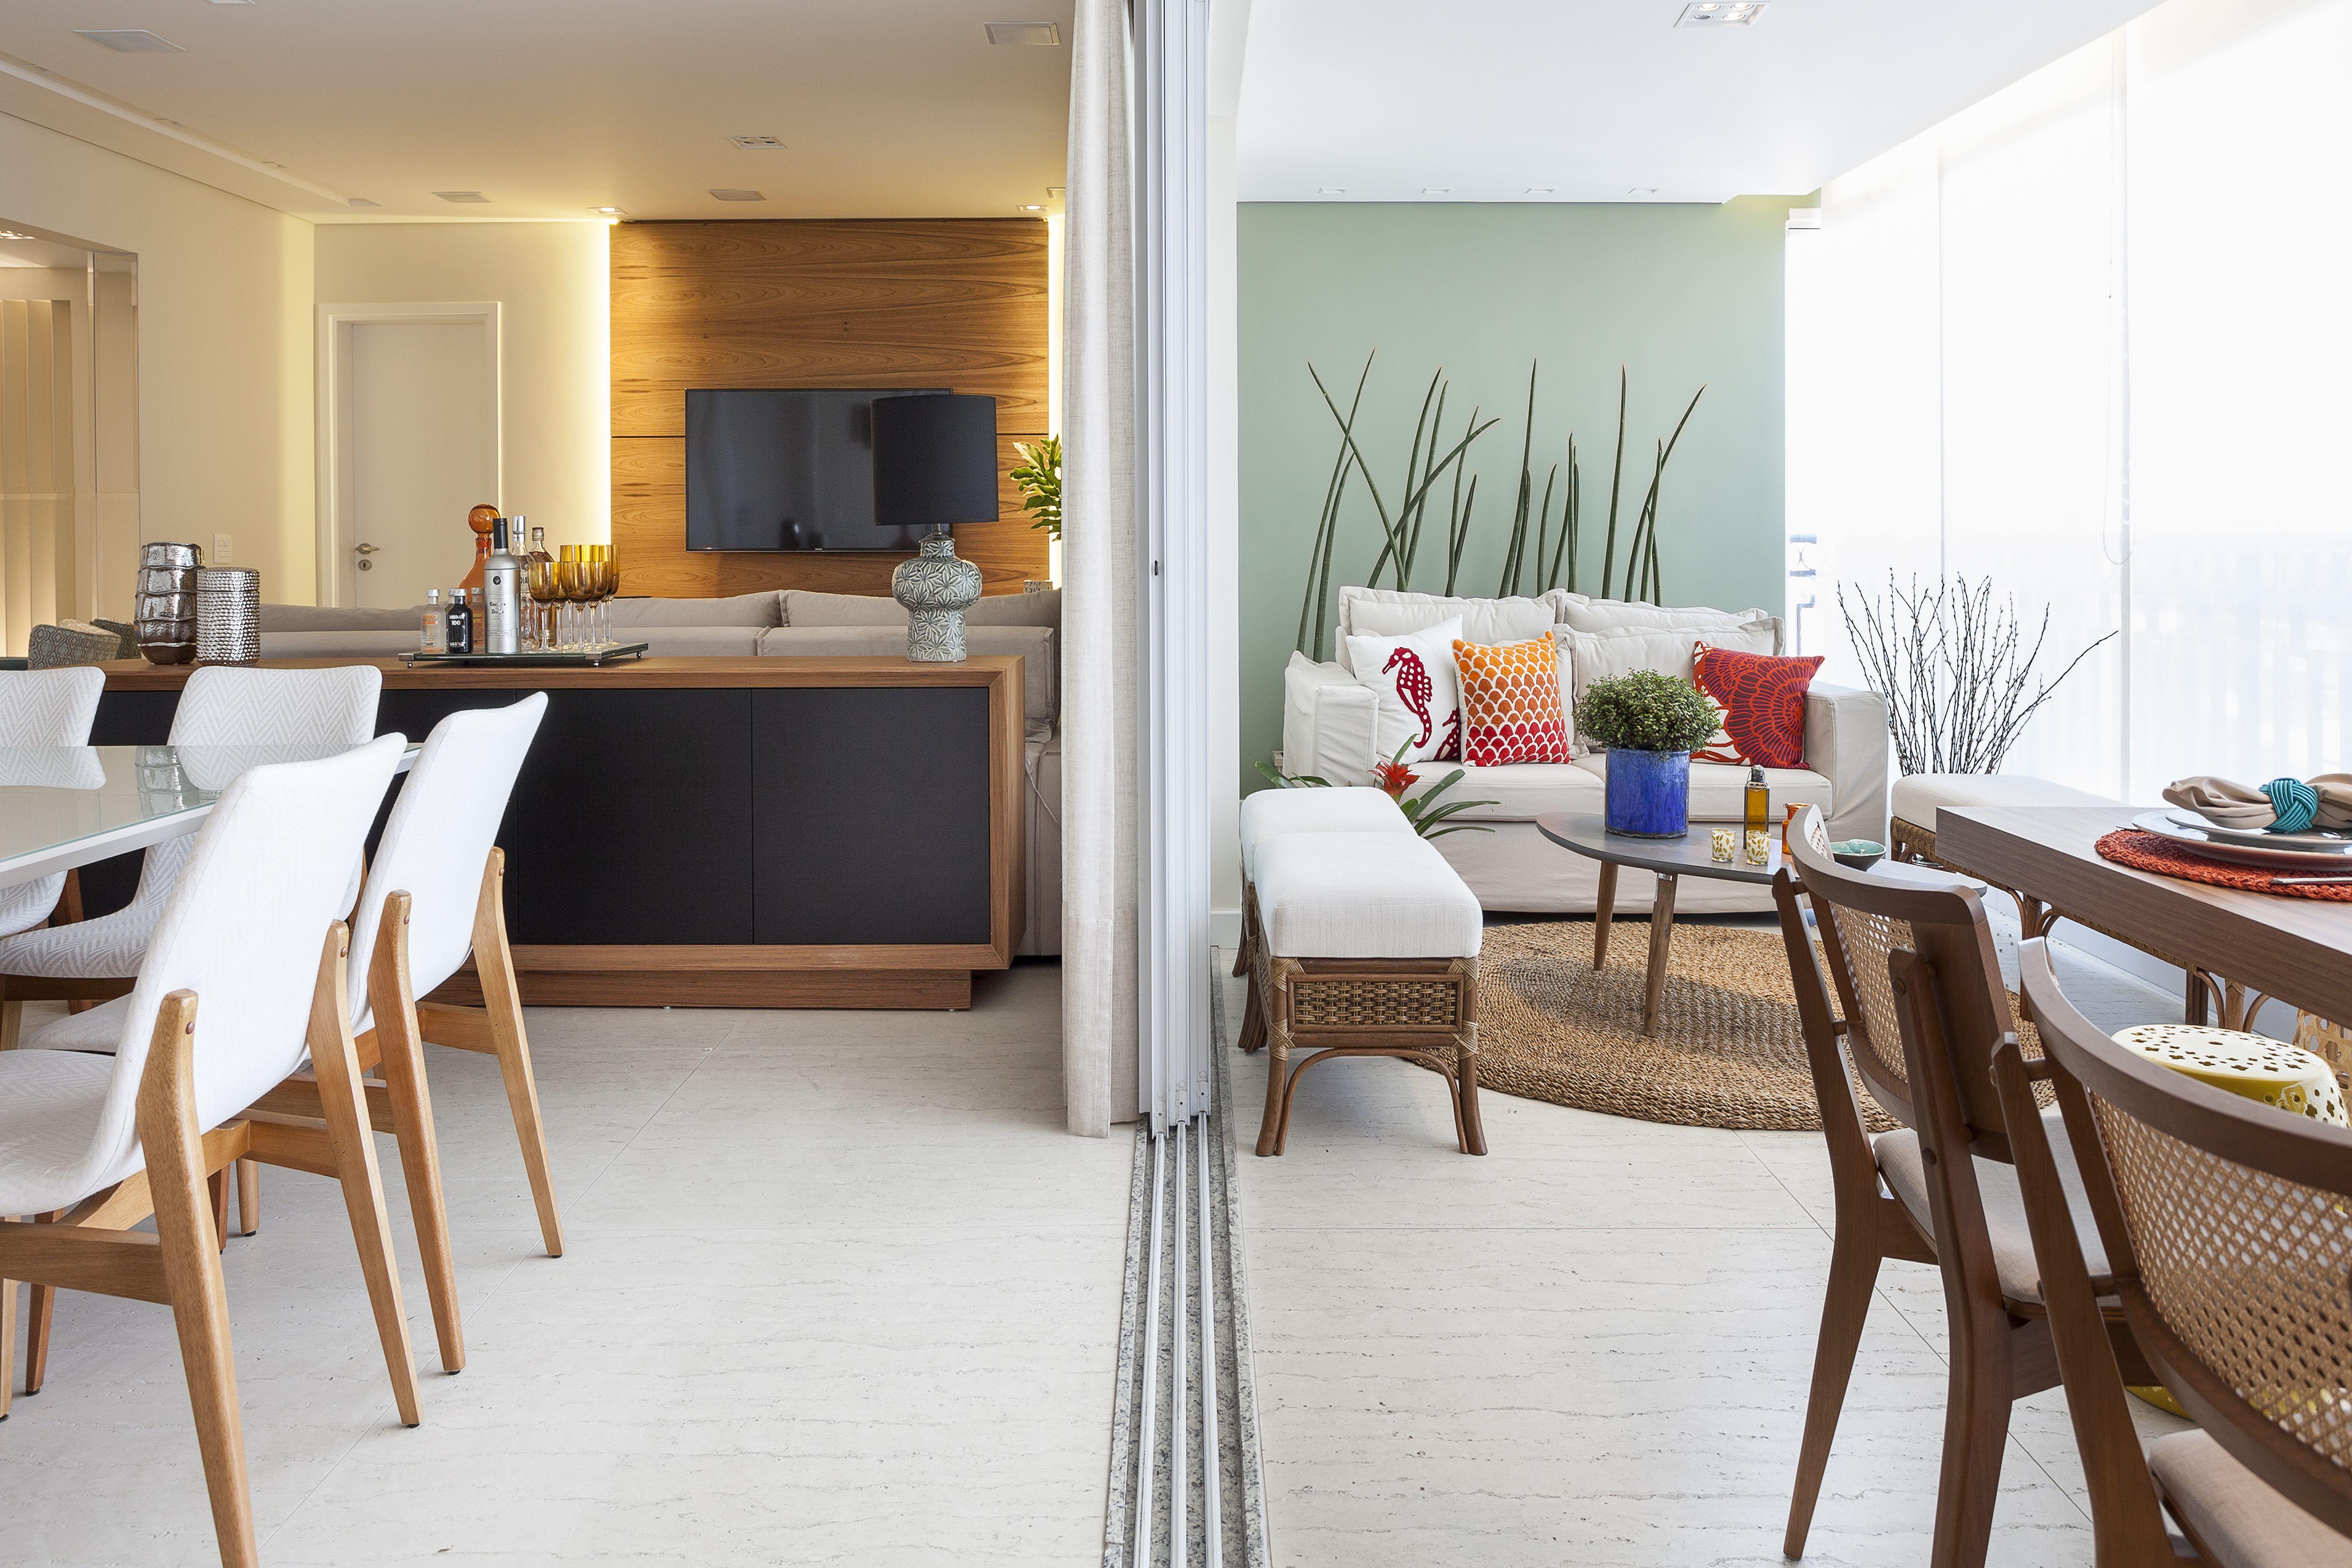 Sala De Jantar E Varanda Gourmet Integradas Pinterest Sacada